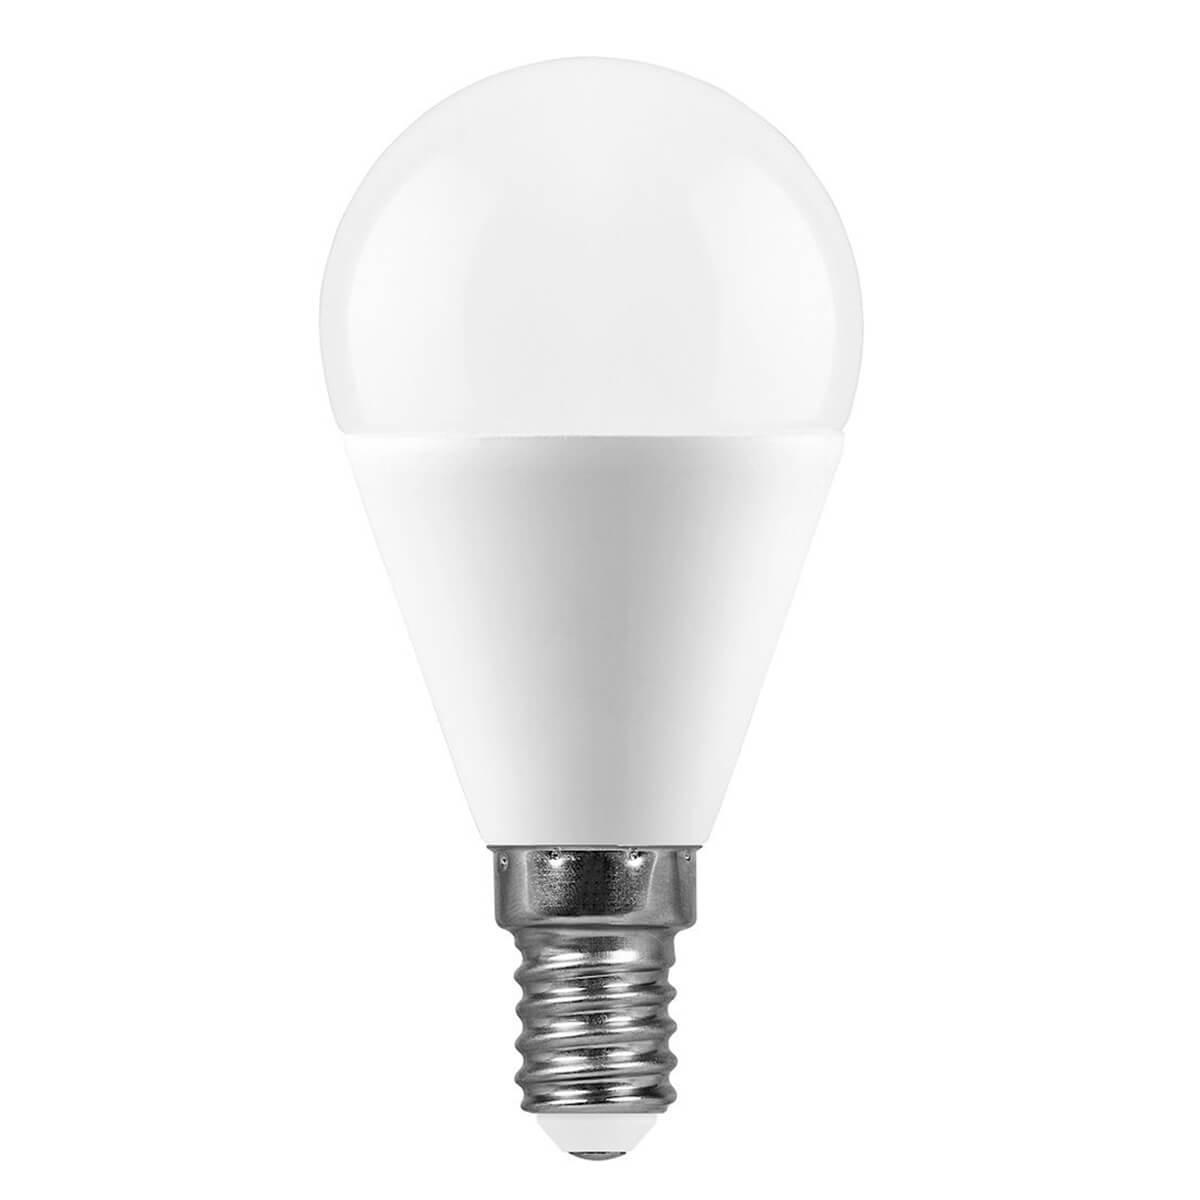 Лампа светодиодная Feron E14 11W 4000K Шар Матовая LB-750 25947